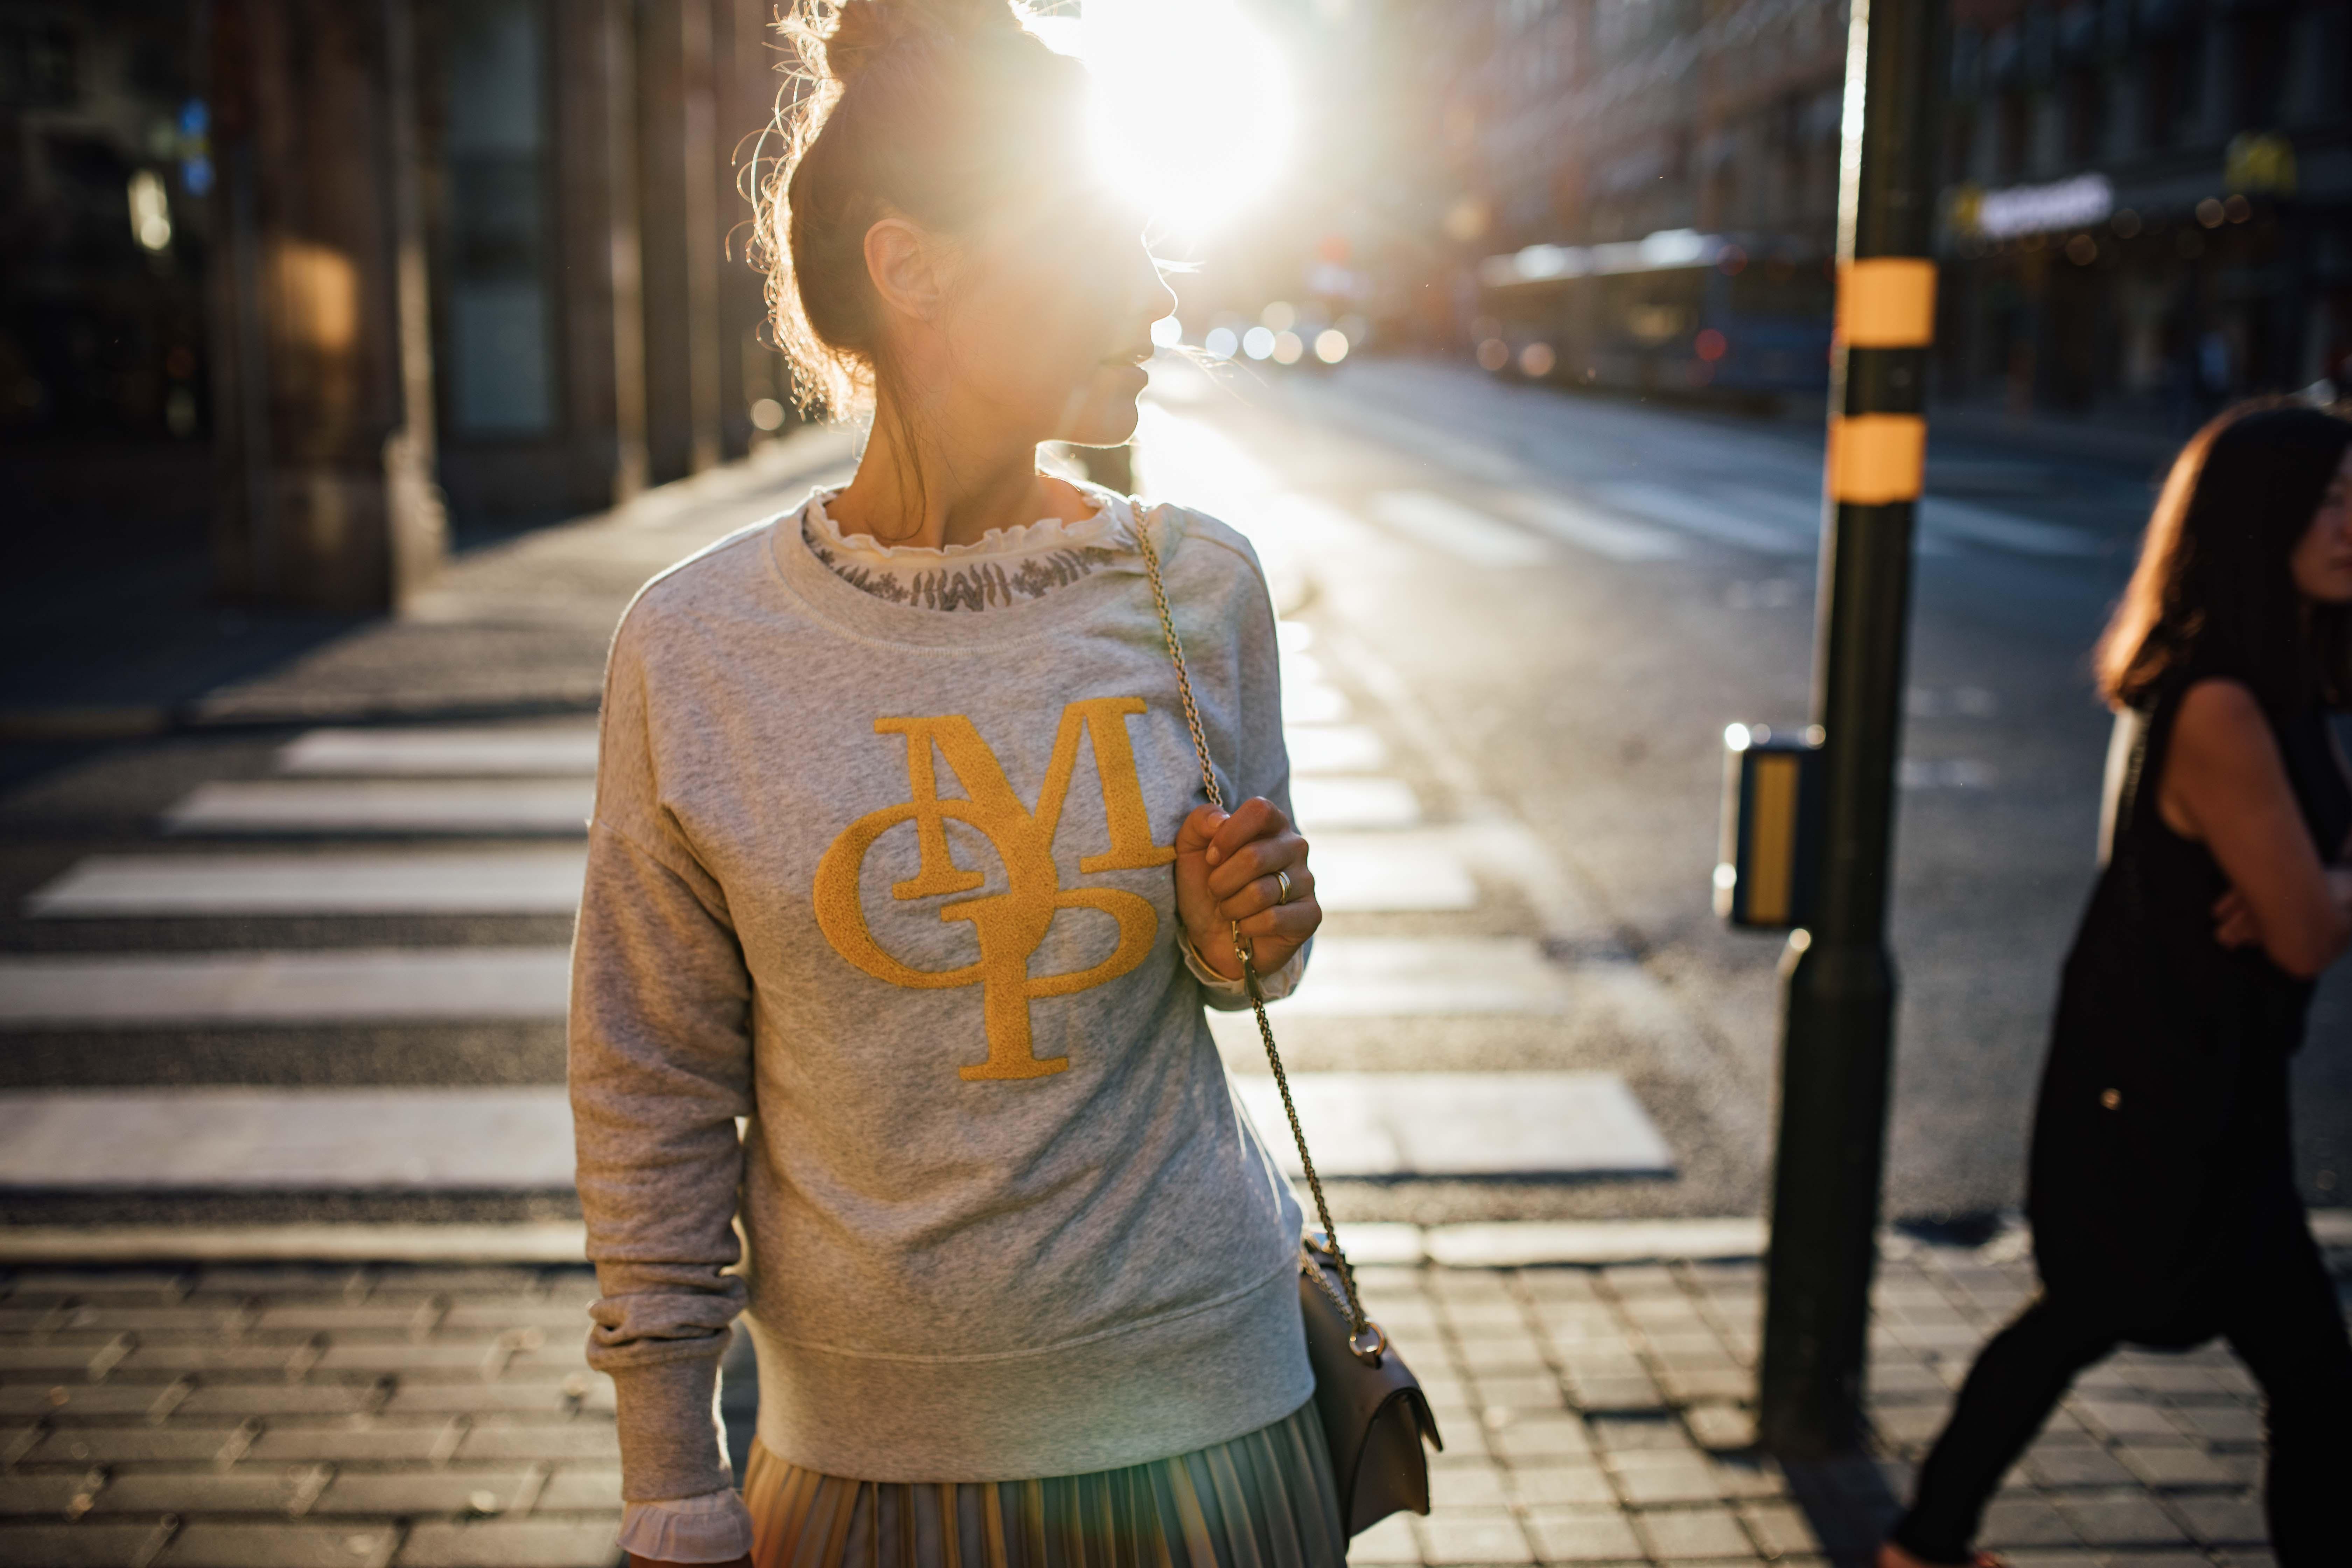 160926_yrml_mop_sweater_web-23